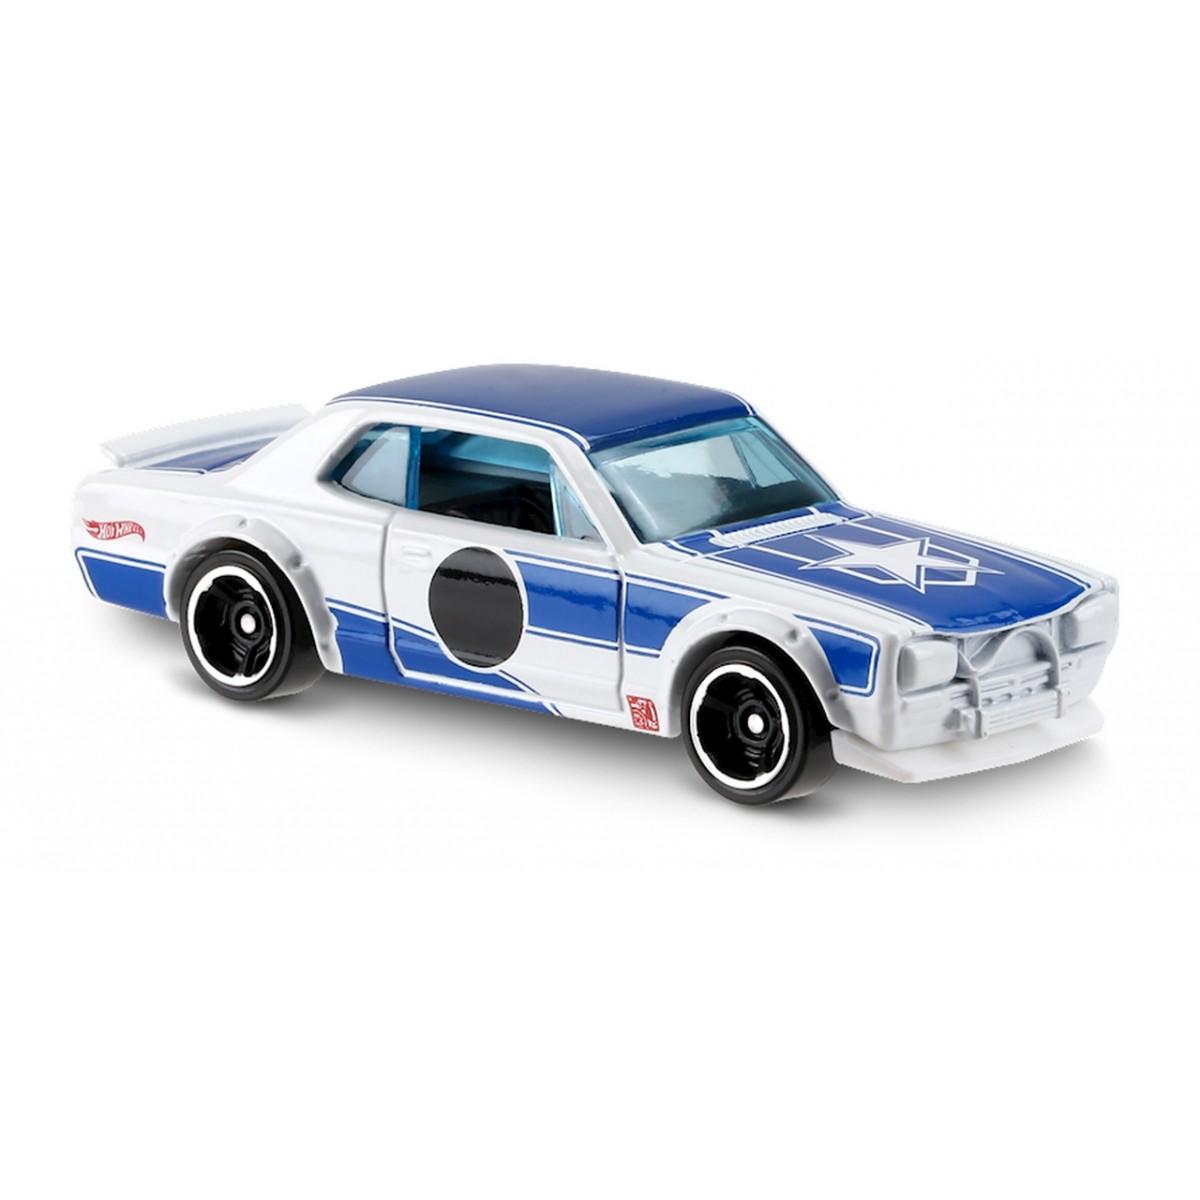 Carrinho Hot Wheels: Nissan Skyline H/T 2000GT-X Branco e Azul